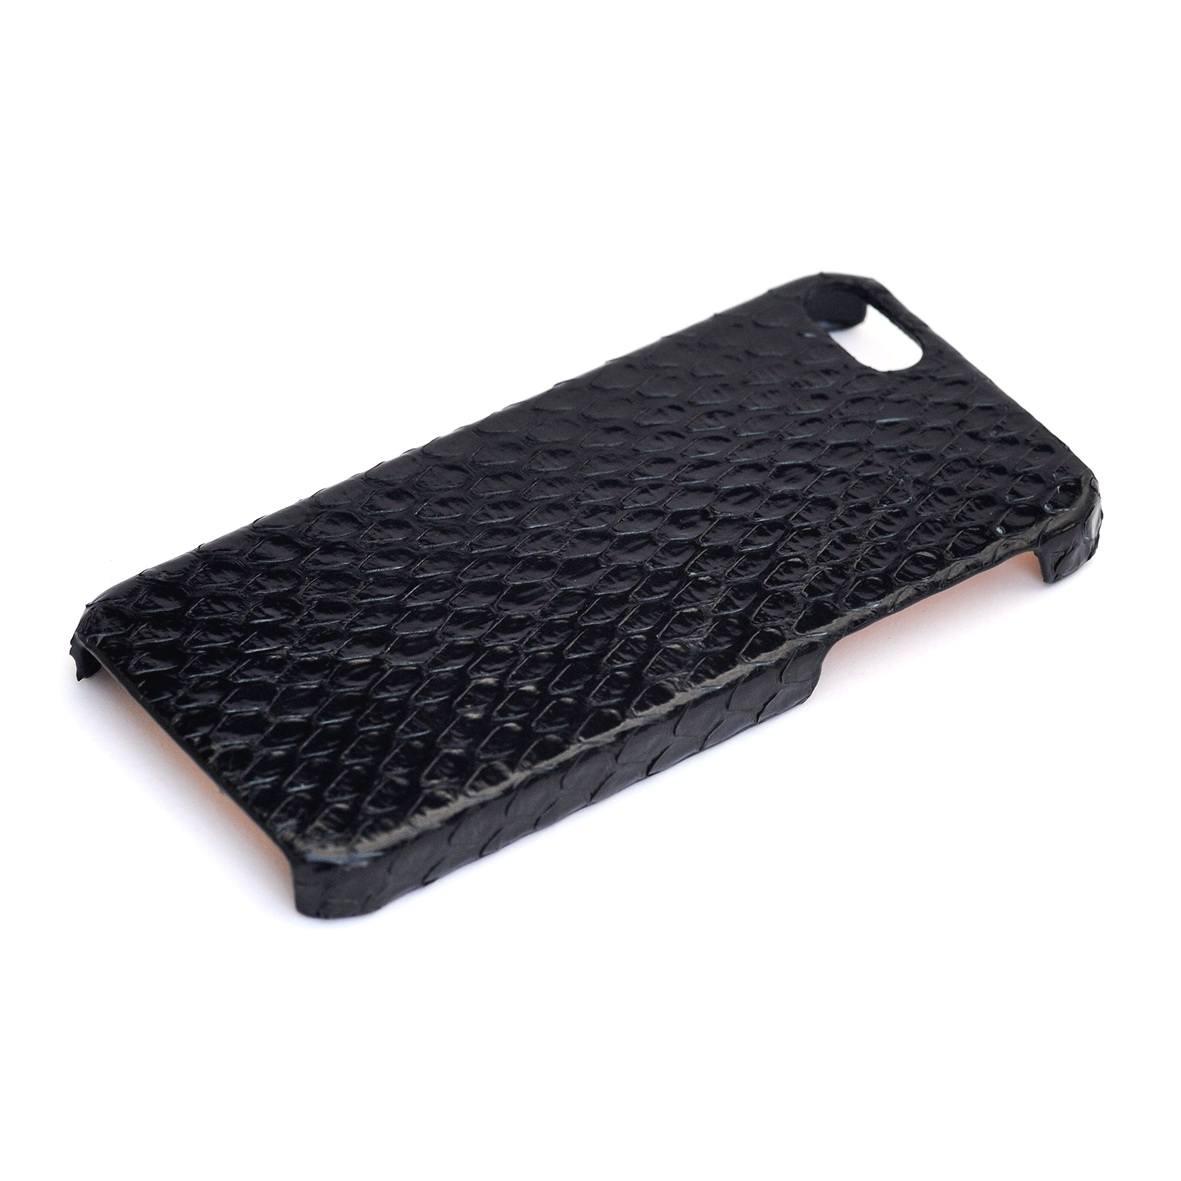 real cobra cover iPhone 5 sort forside